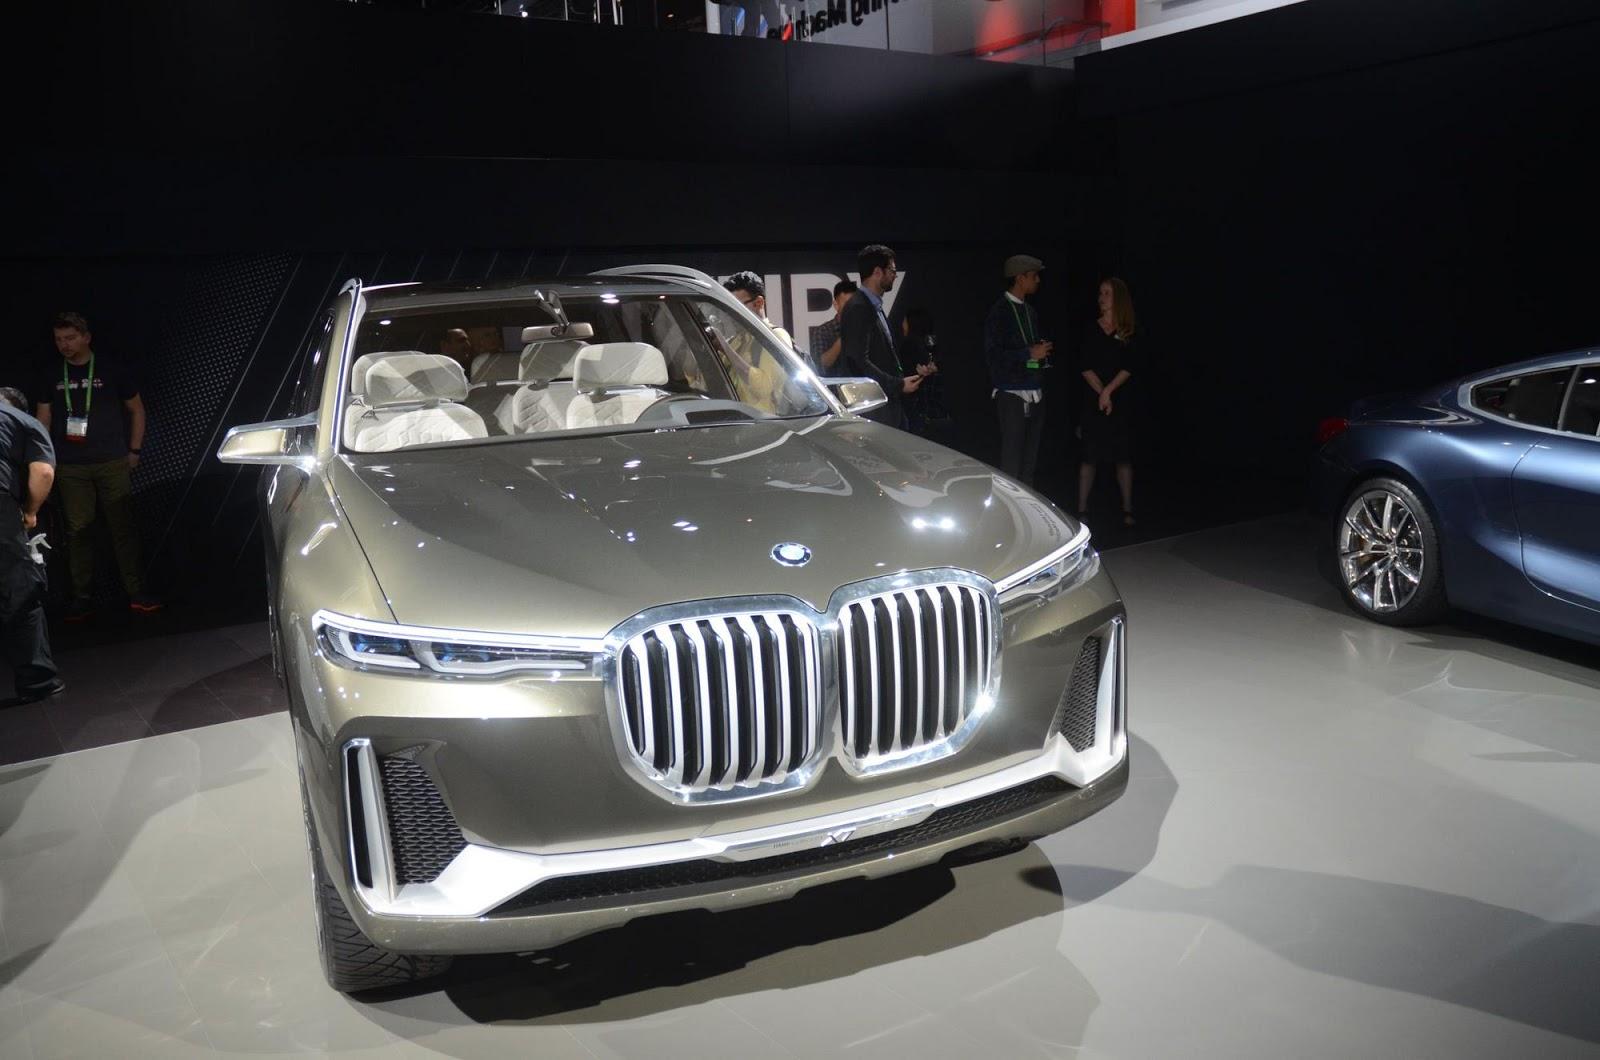 100 Hot Cars 187 Bmw X7